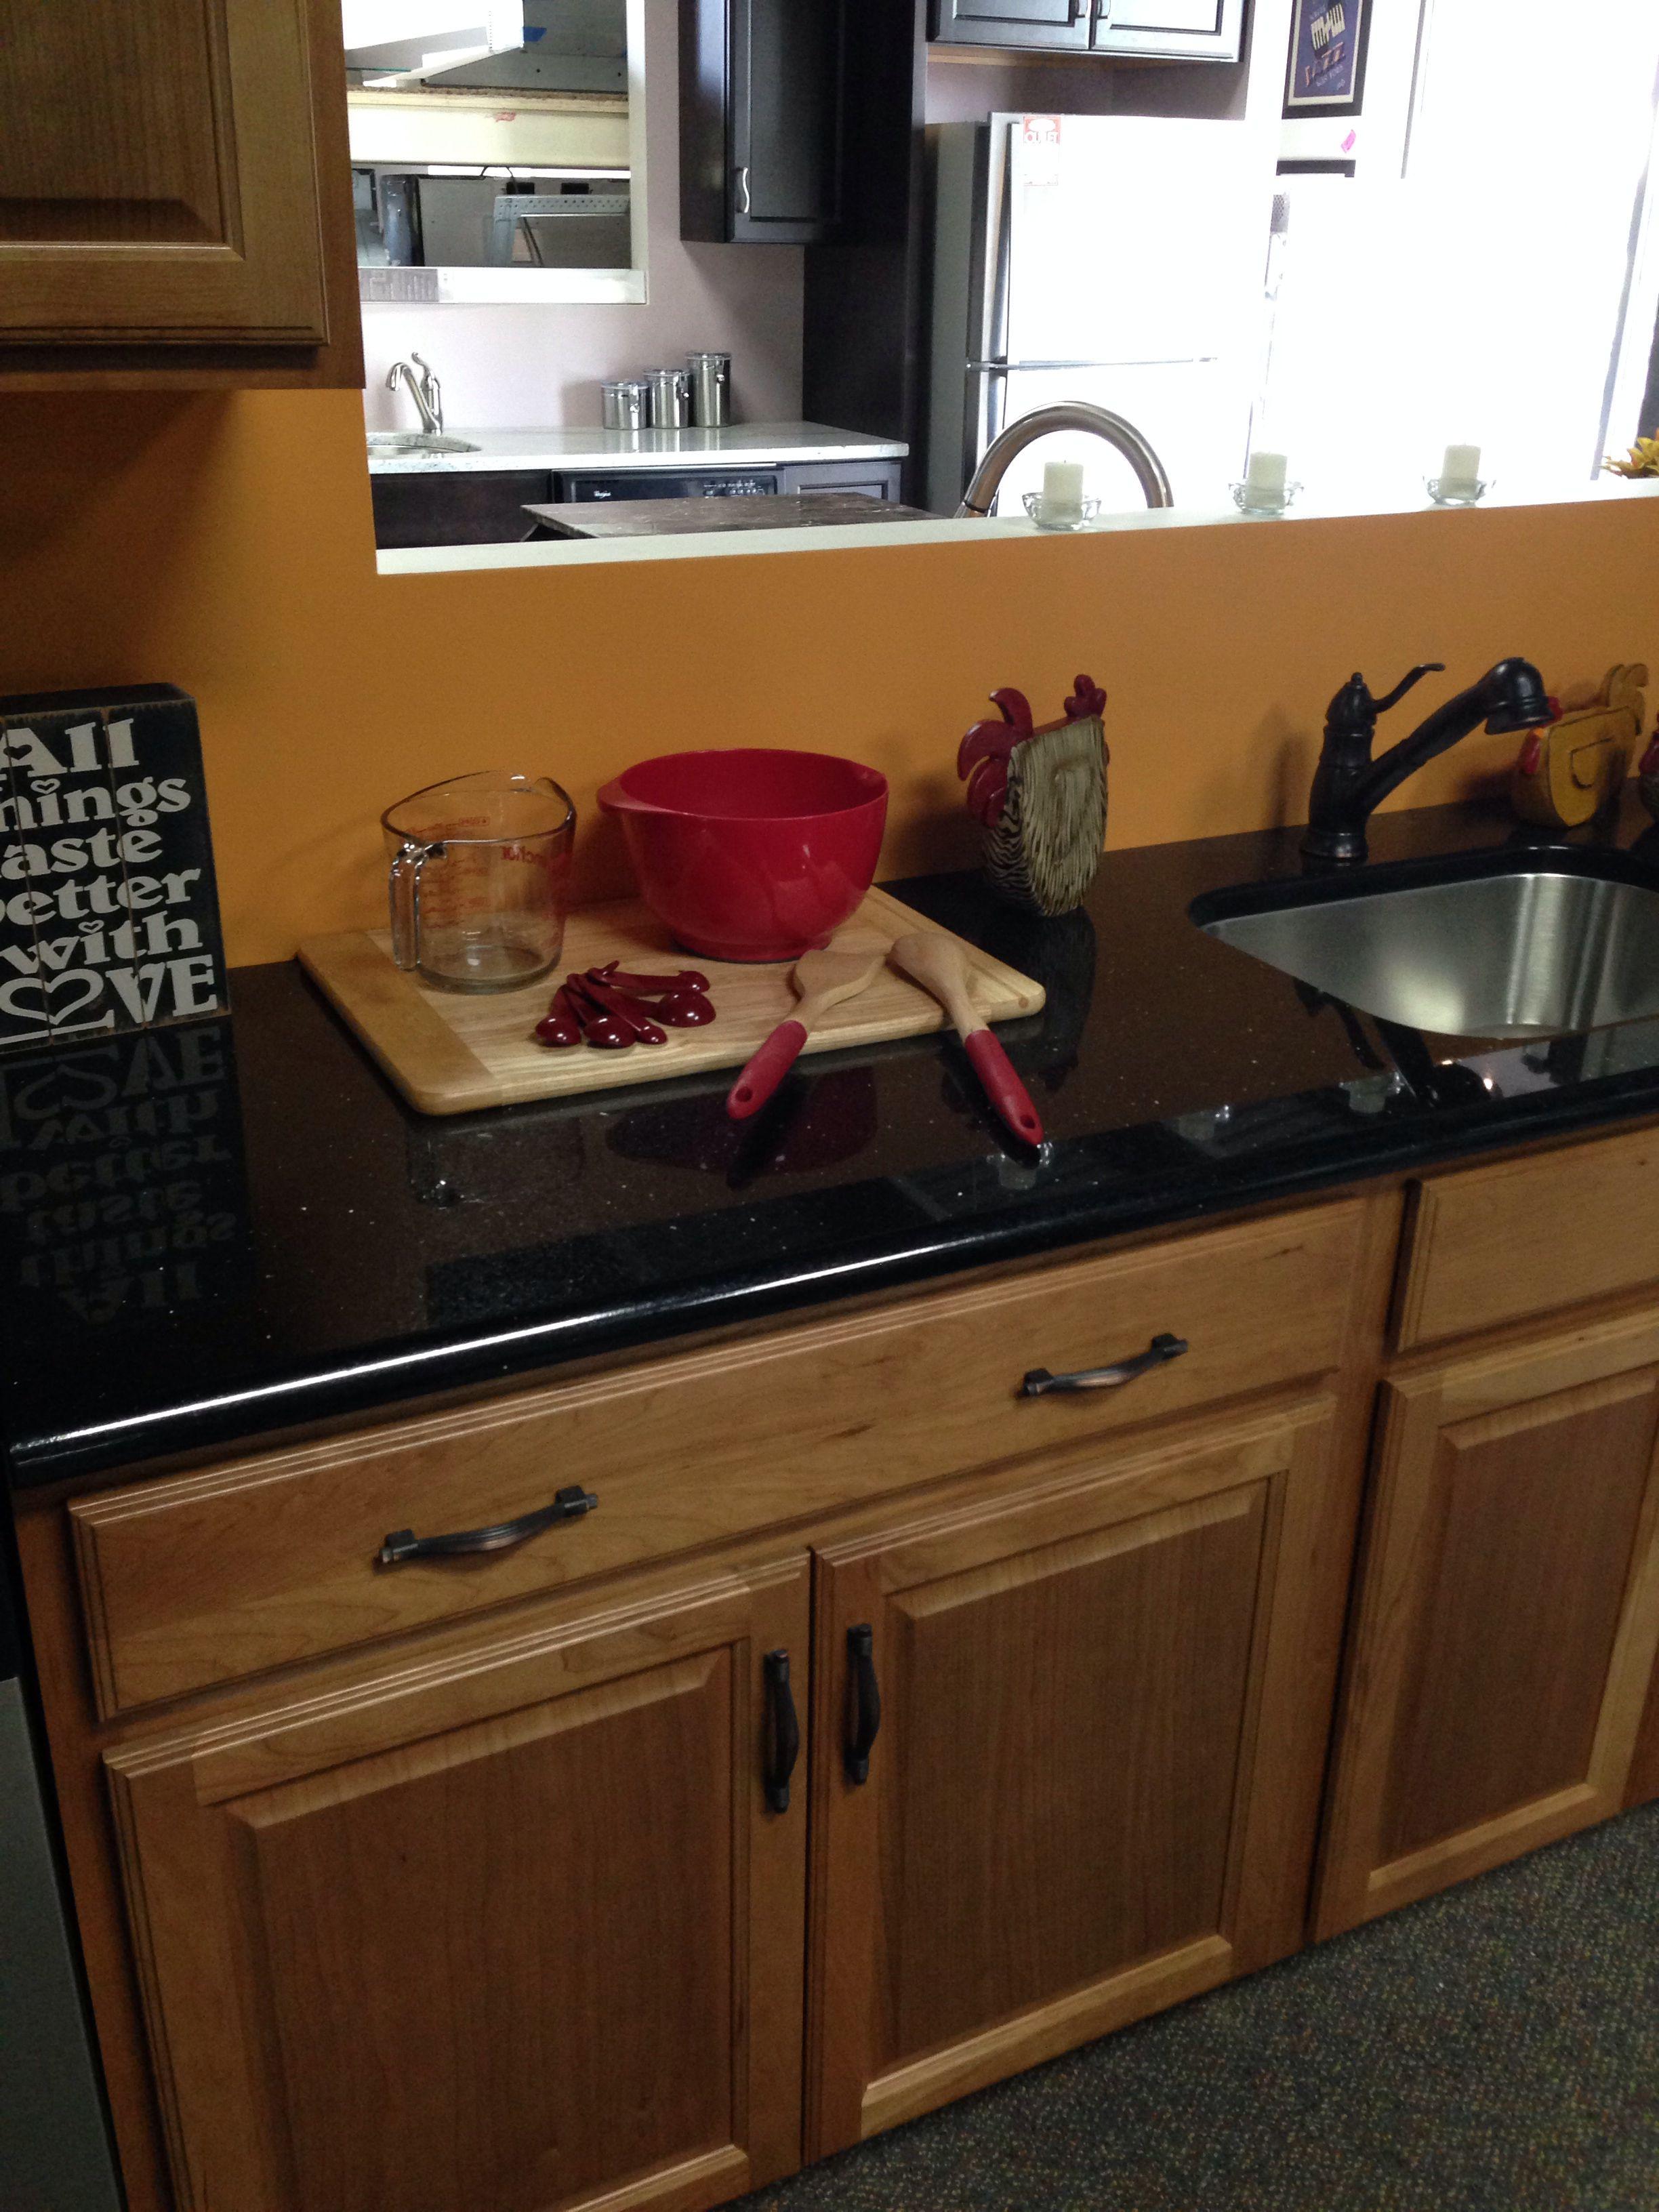 black countertop with oak cabinets oak cabinets kitchen cabinets kitchen on kitchen decor black countertop id=41361